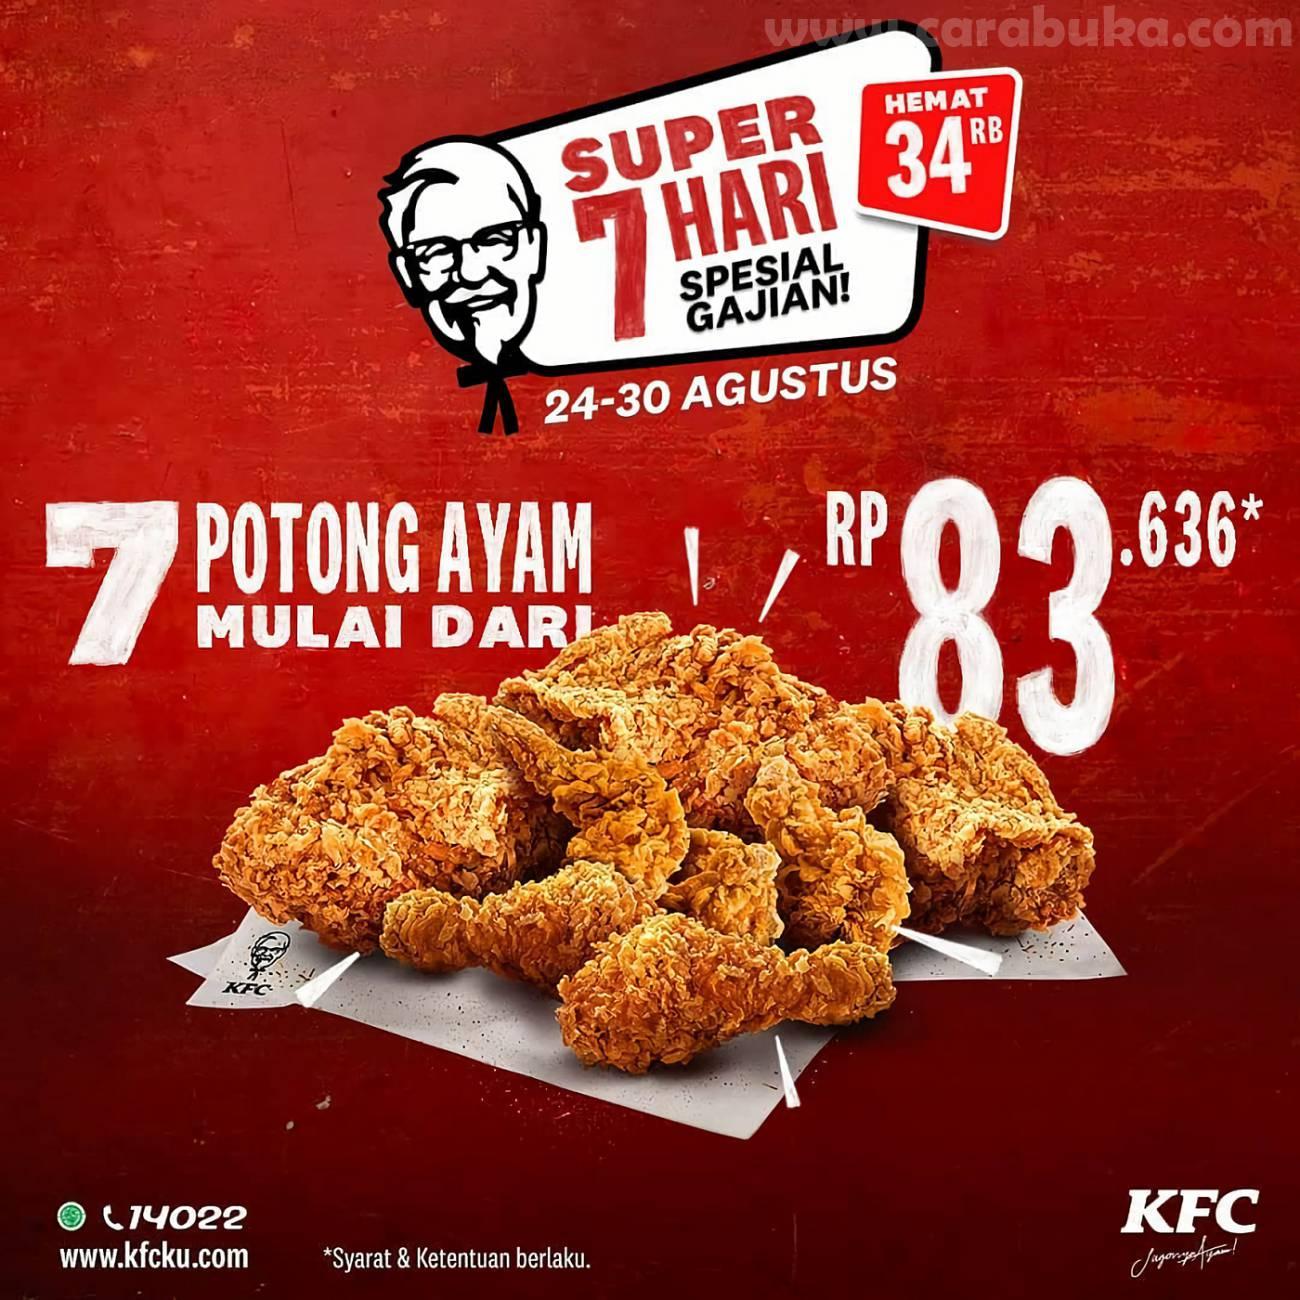 Gila! Promo KFC Super 7 Spesial Gajian Bulan Agustus 2020 Berlaku Selama 7 Hari